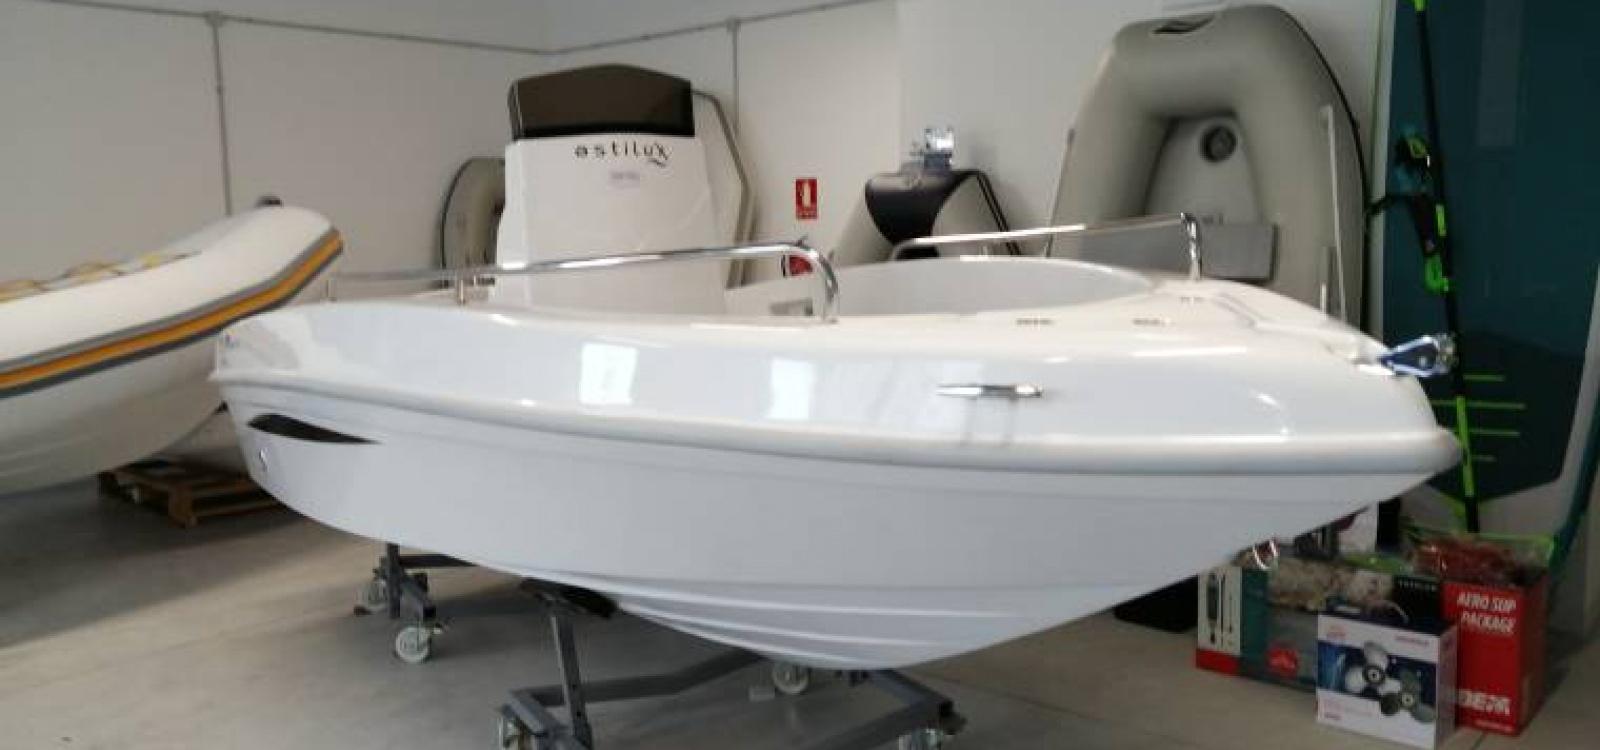 Vigo,Pontevedra,España,Barco a motor,2148